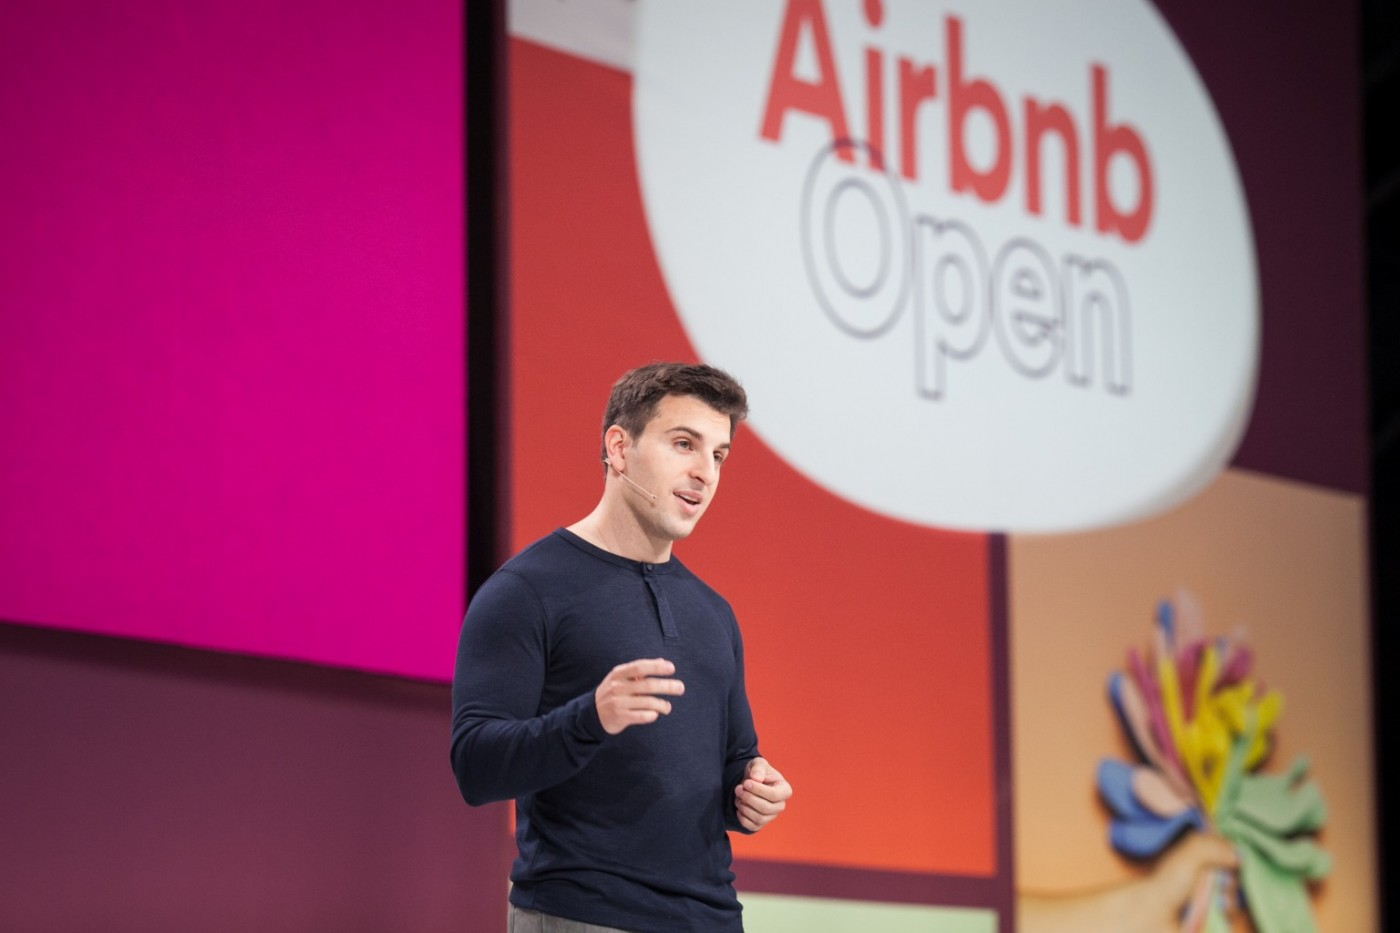 挖角亞馬遜17年財務老將,Airbnb為2019年IPO蓄勢待發